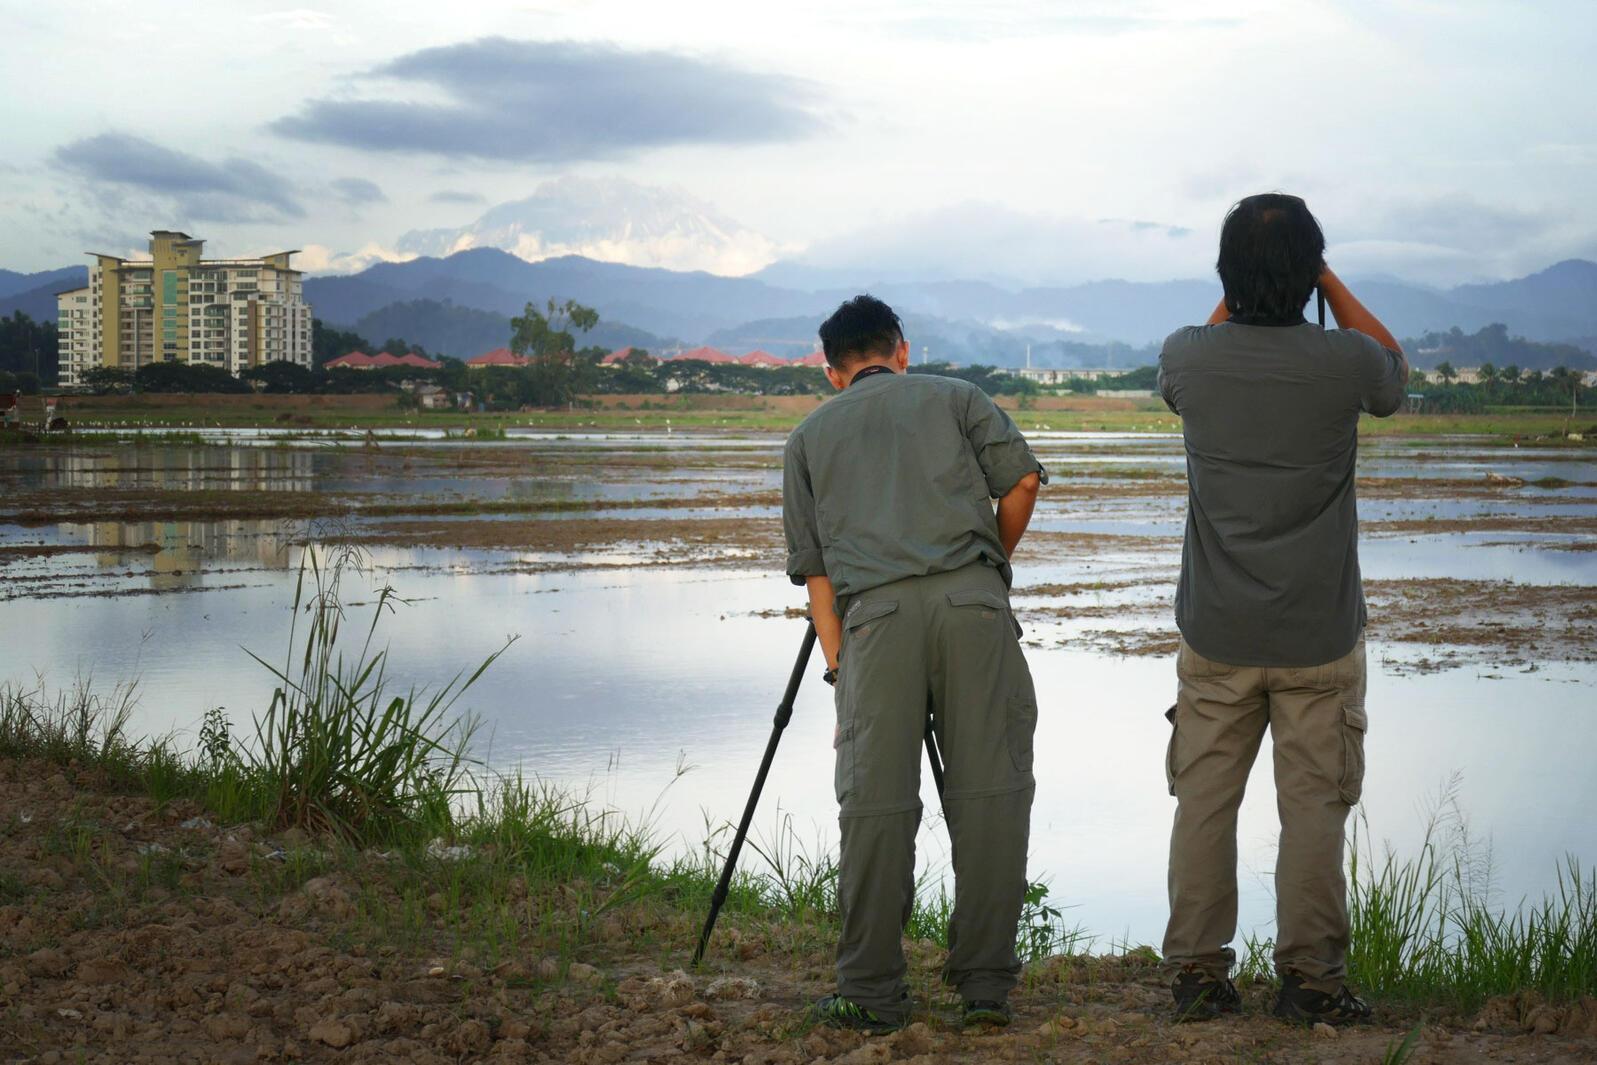 Birding on the outskirts of Kota Kinabalu. Noah Strycker